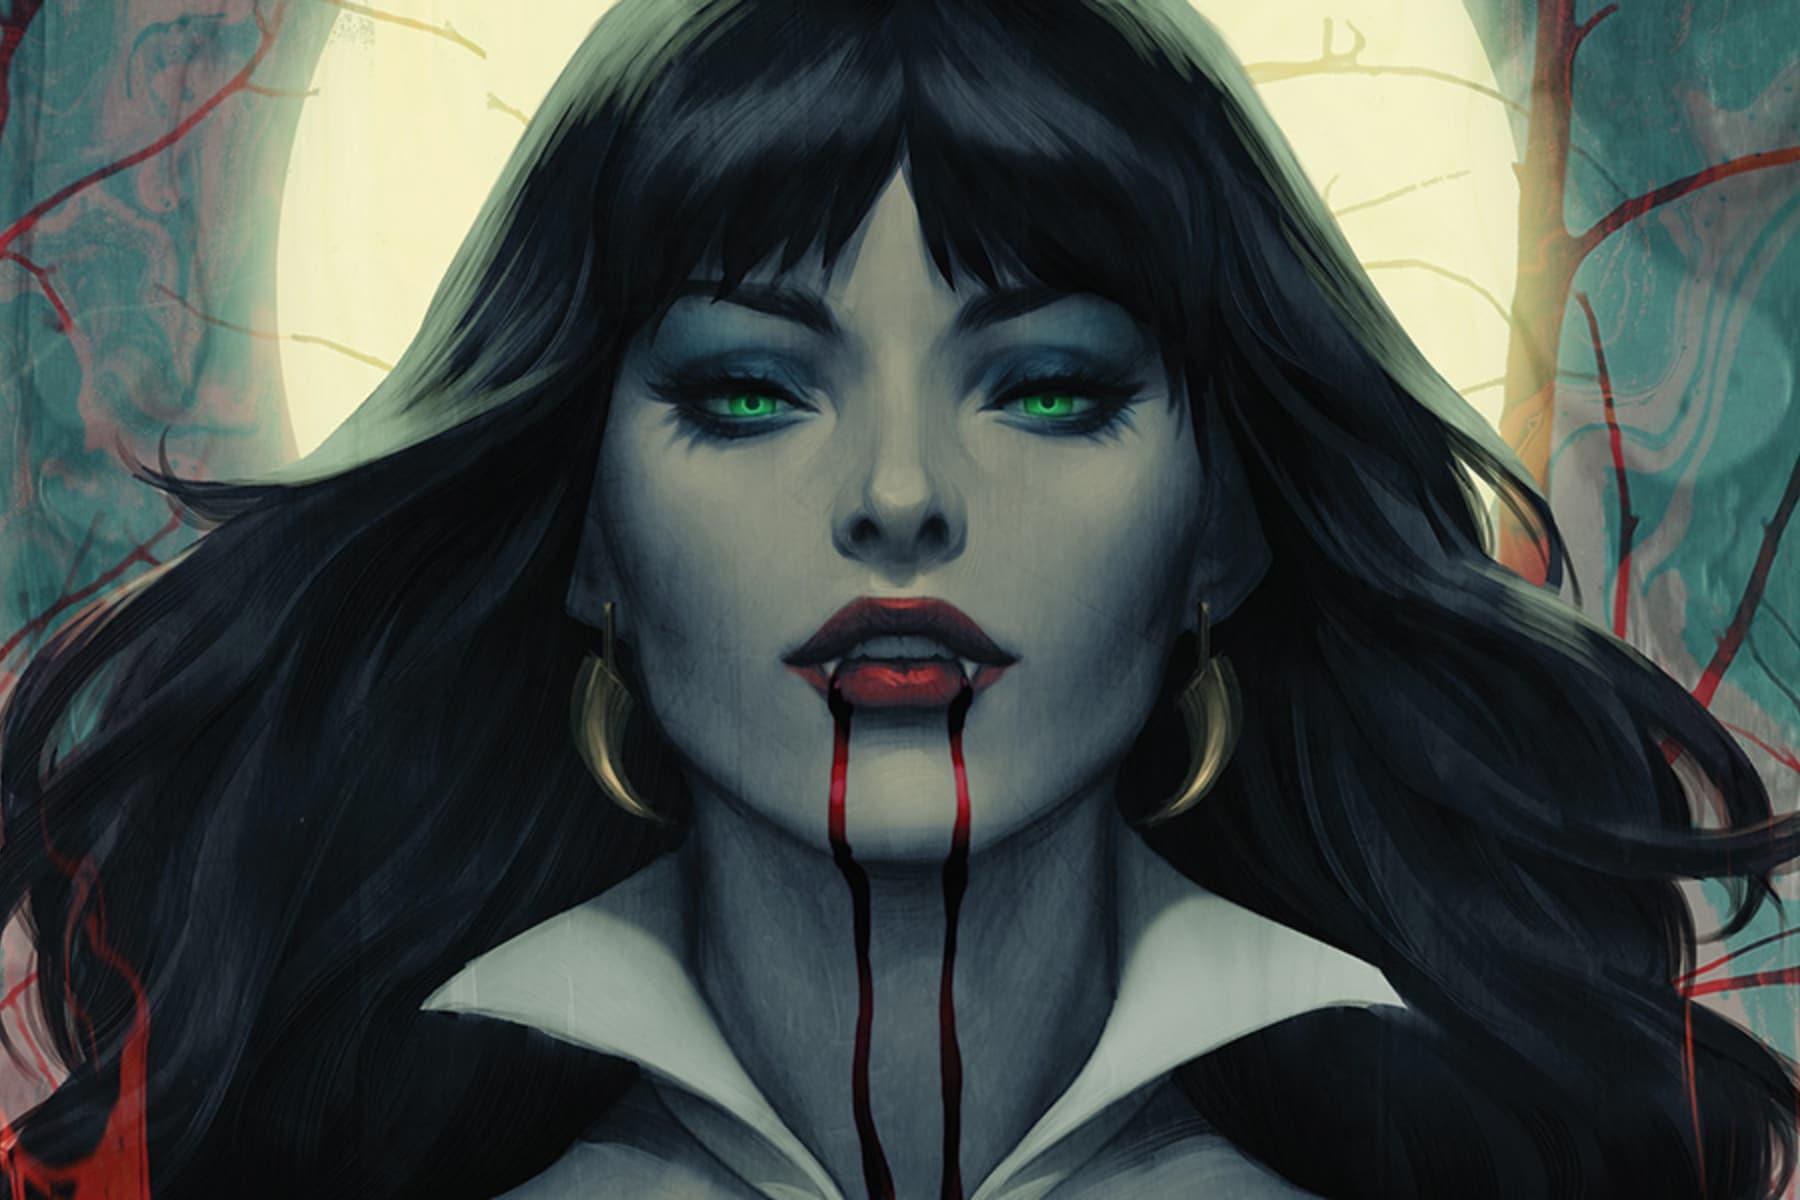 'Vampirella' Radio Plays As A 'Sleeping Beauty' Metaphor